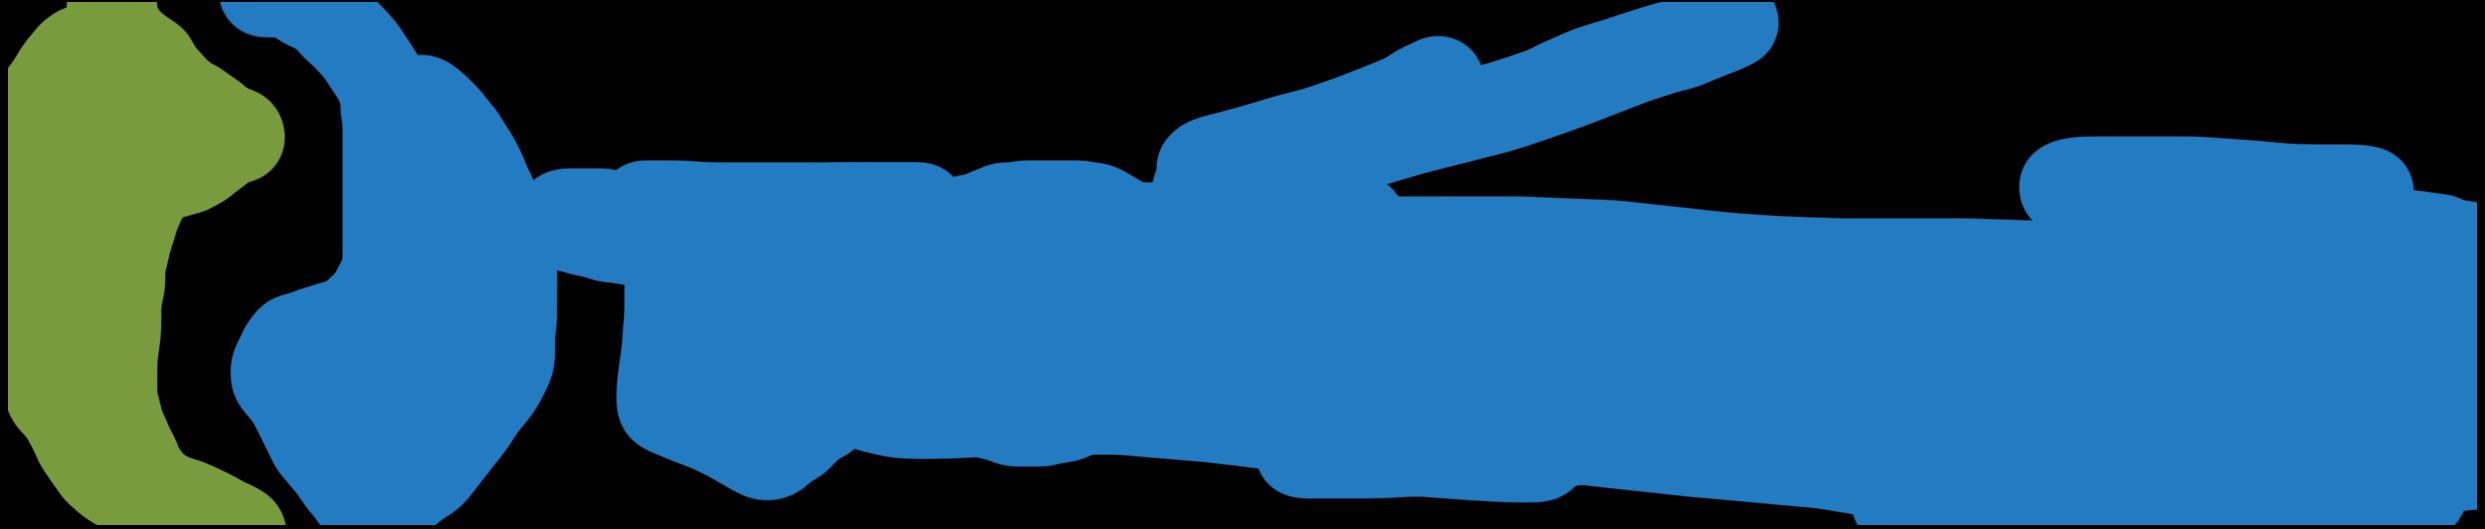 TC Énergie